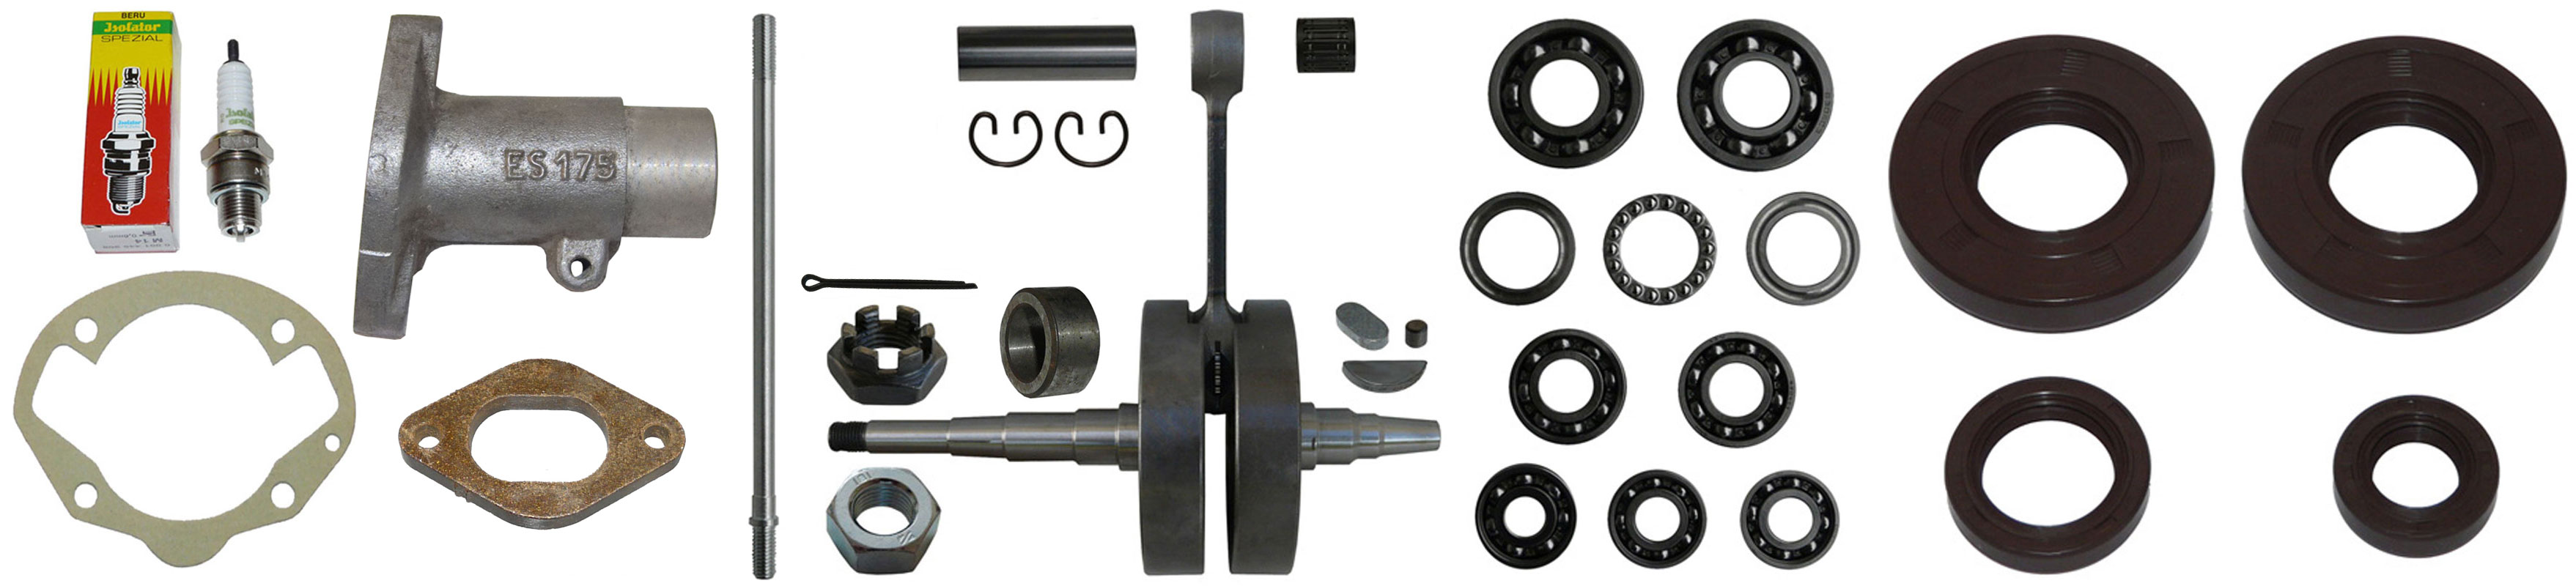 MZ ES 175-250/0-1 Ersatzteile Motor Zylinder Kurbelwelle